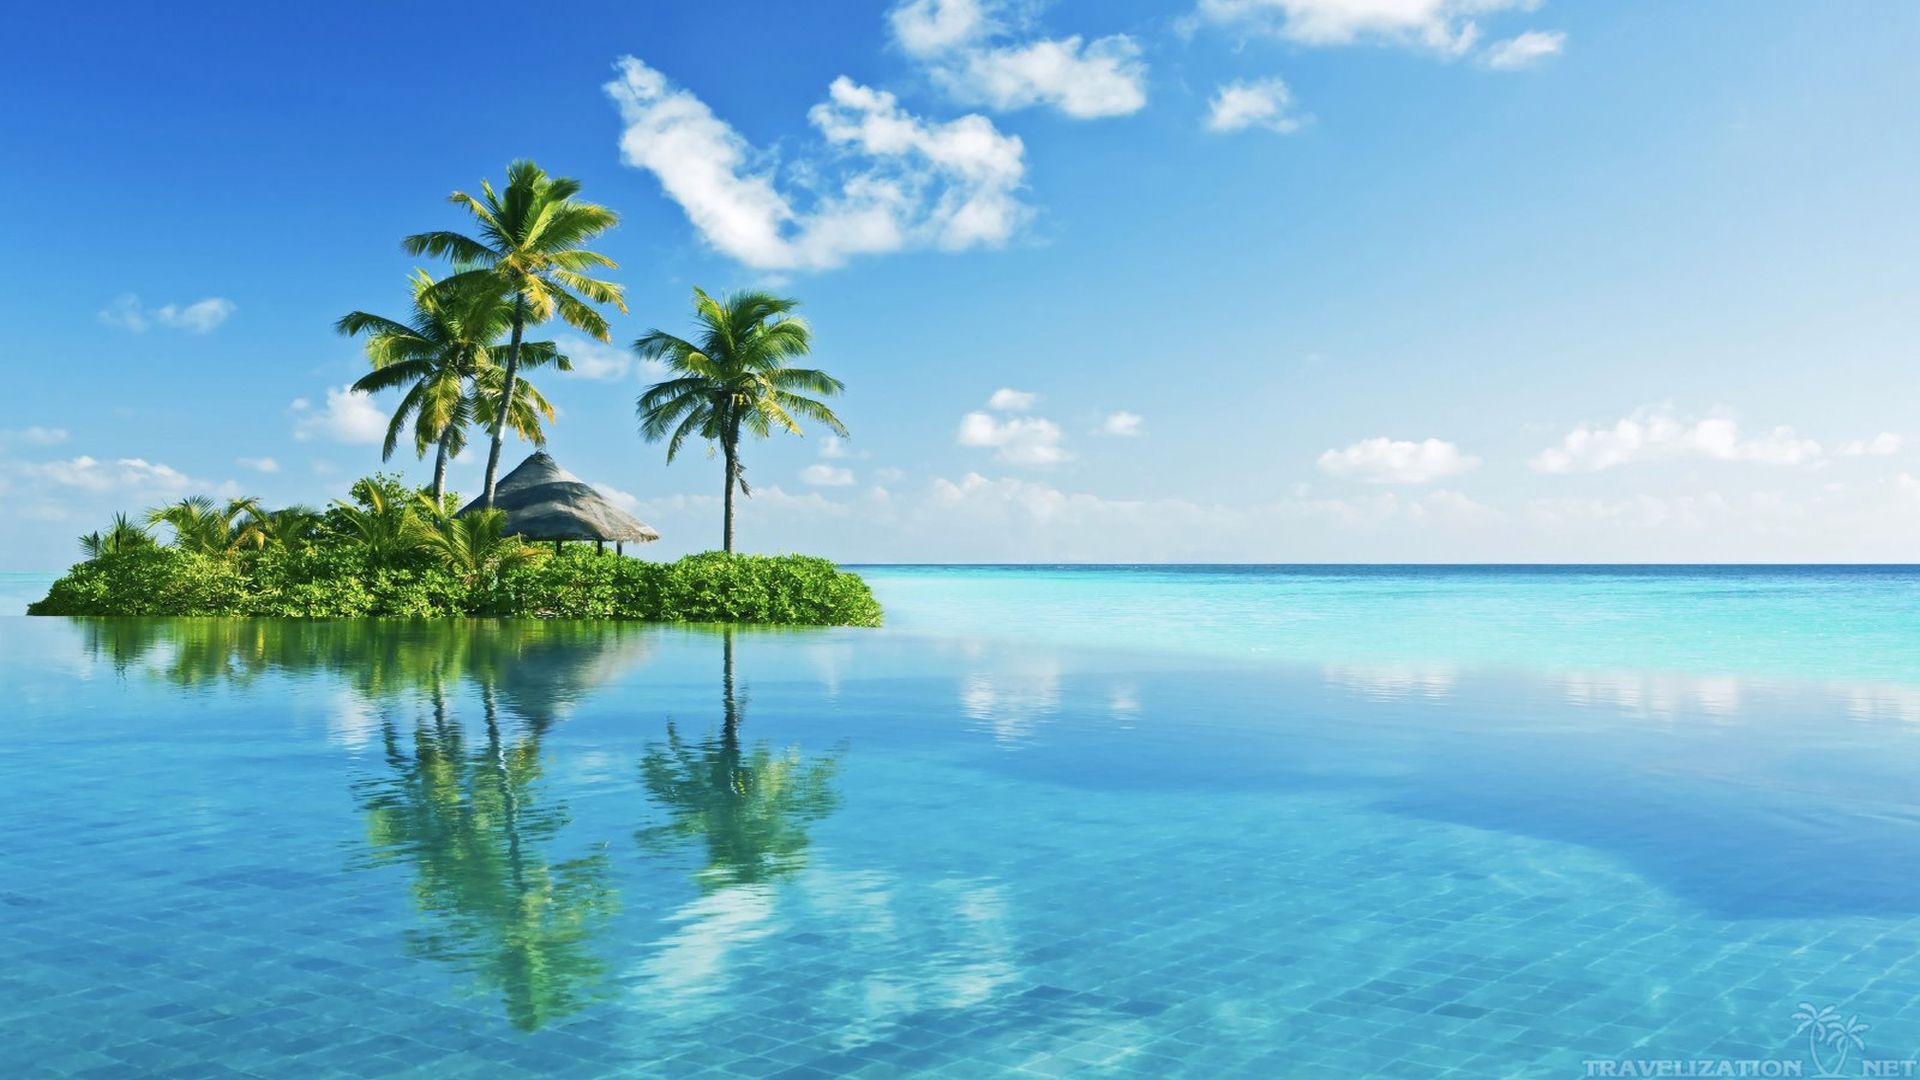 Beautiful Tropical Islands Hd 19201080 Island Wallpaper Tropical Islands Tropical Beach Resorts